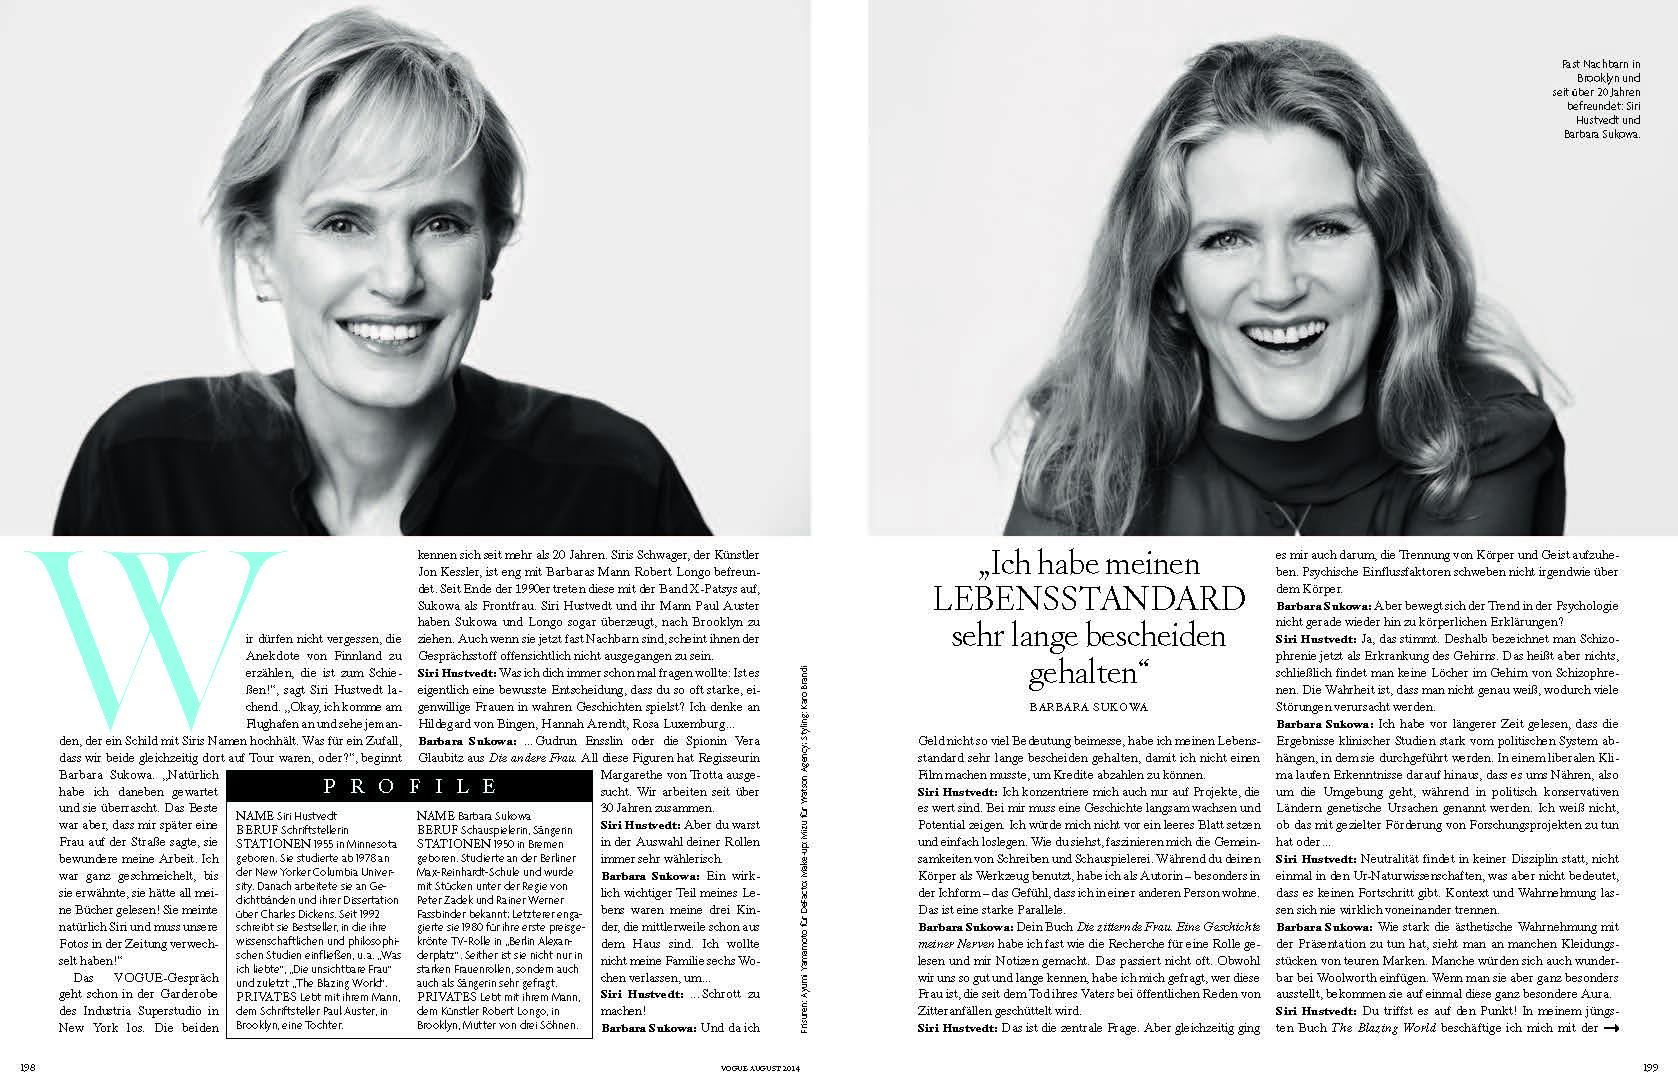 Siri Hustvedt + Barbara Sukowa